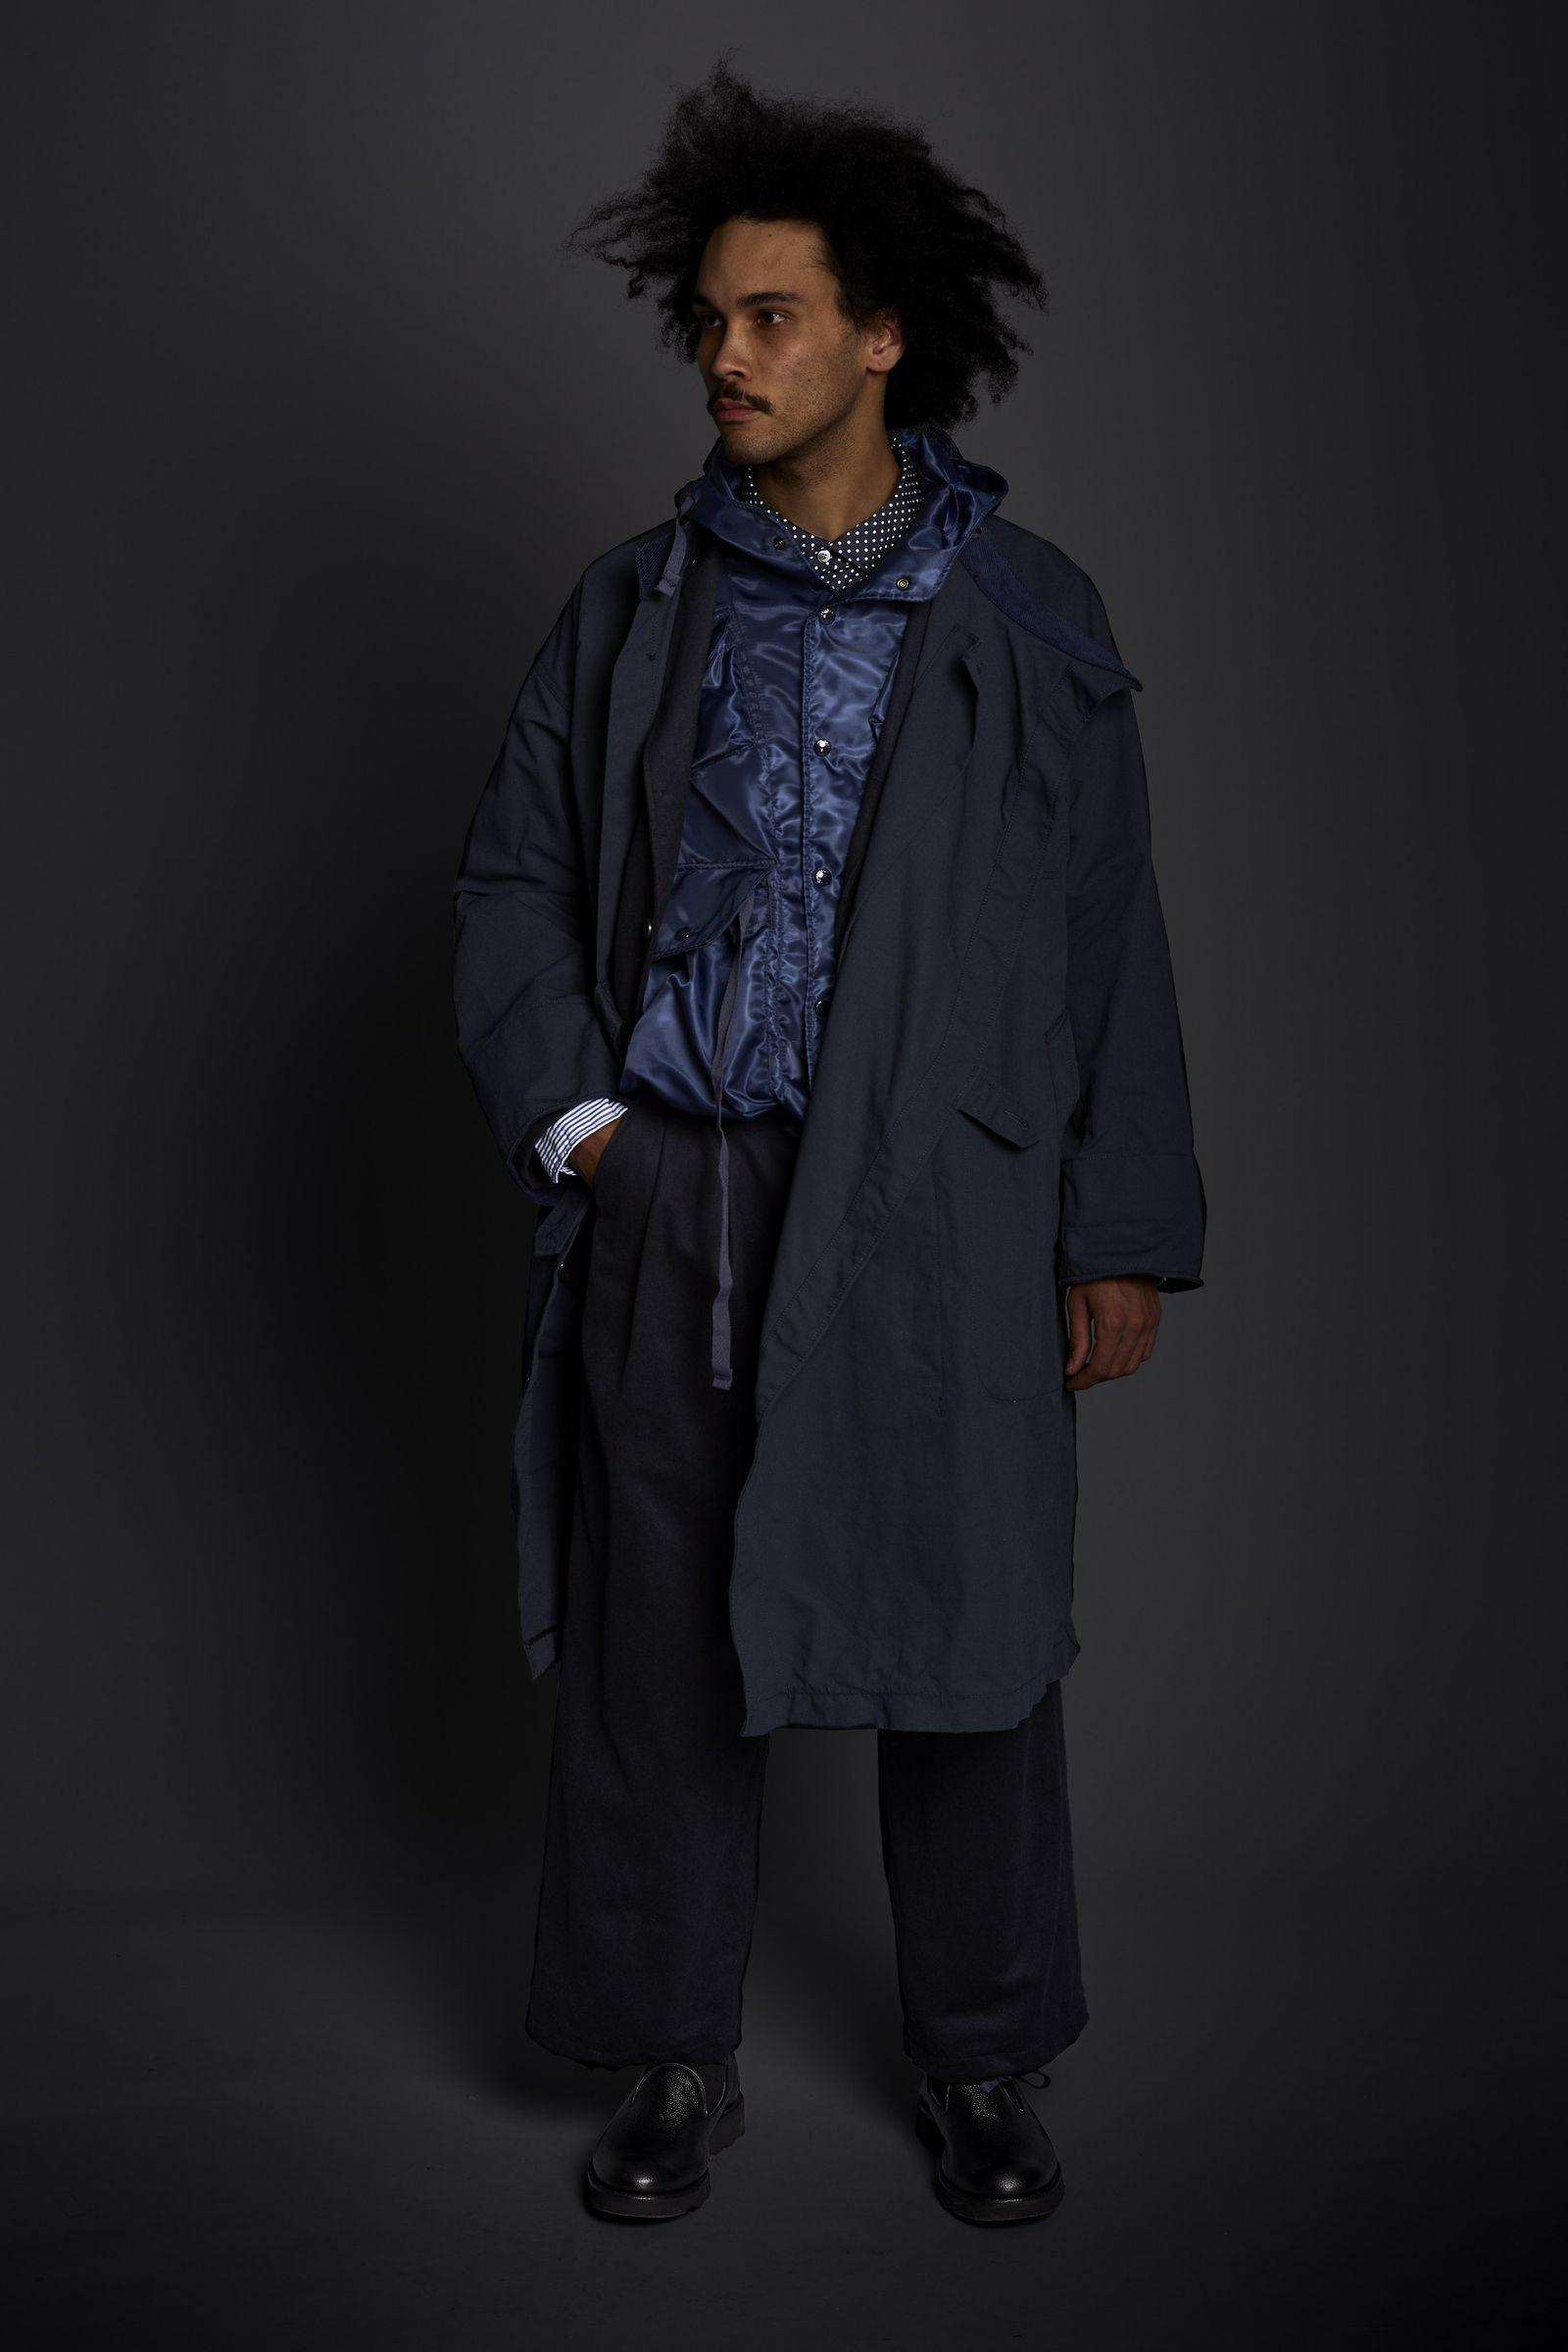 engineered-garments-fall-winter-2020-13